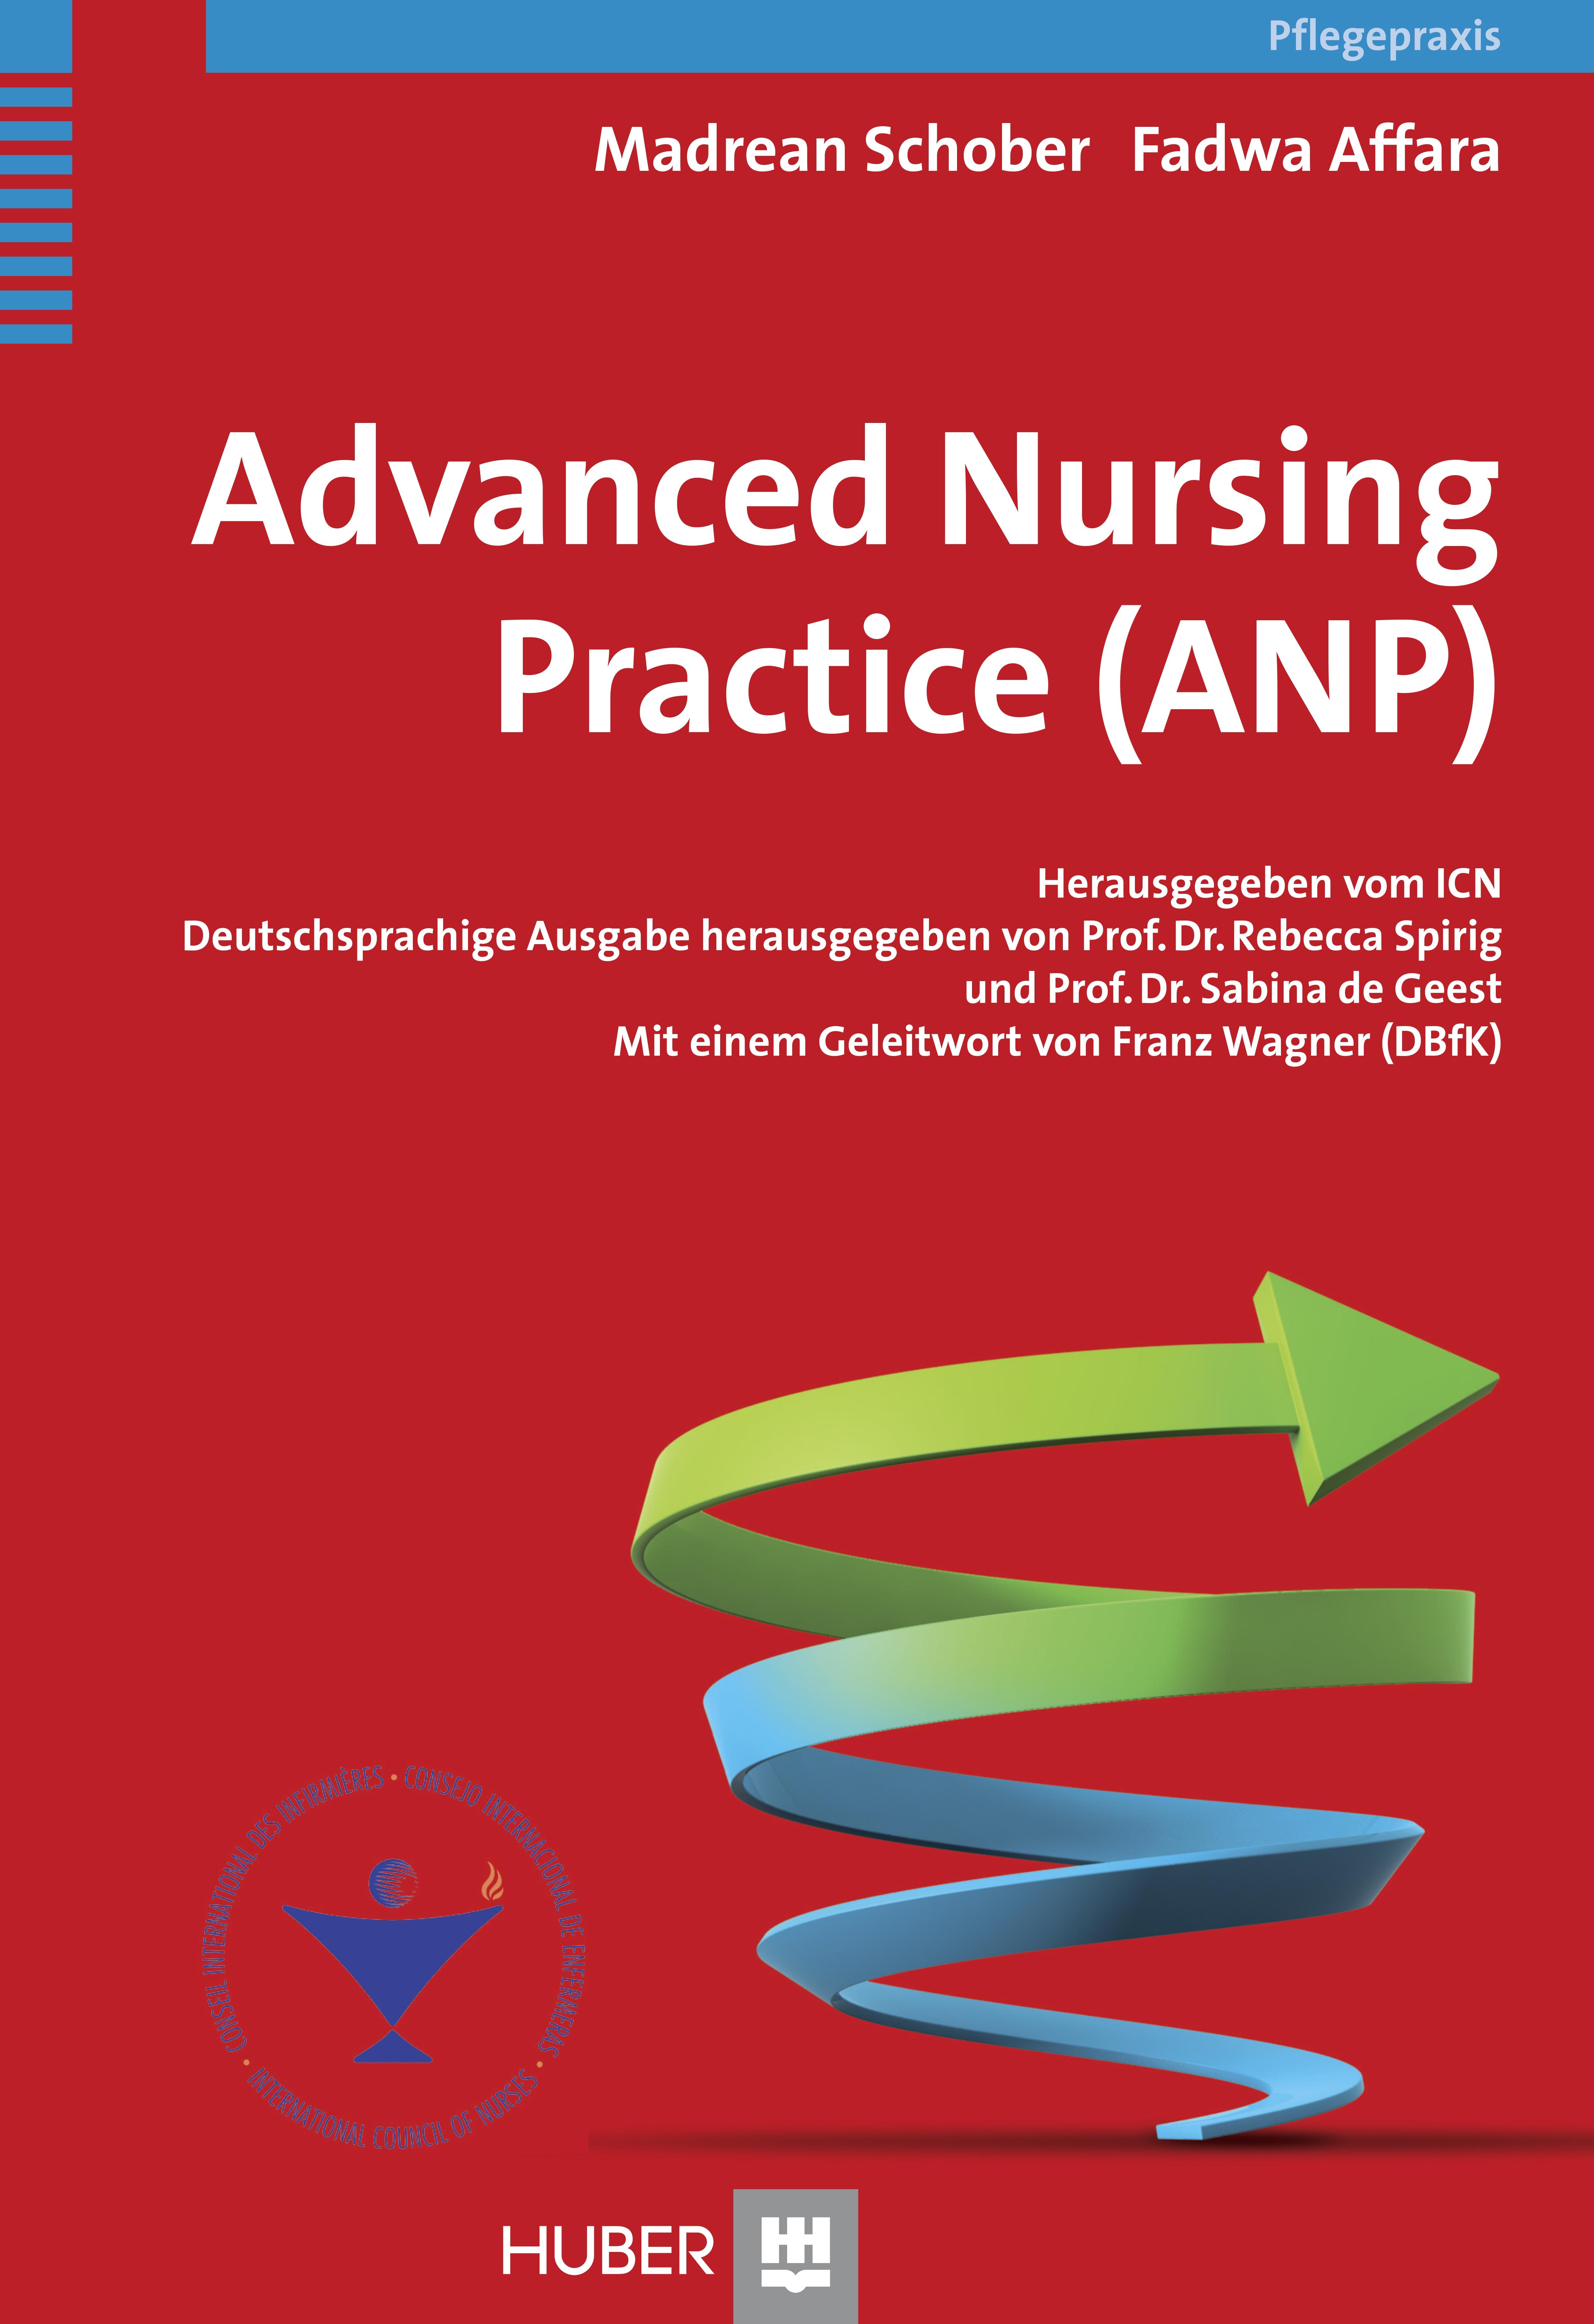 Advanced Nursing Practice (ANP), Fadwa Affara